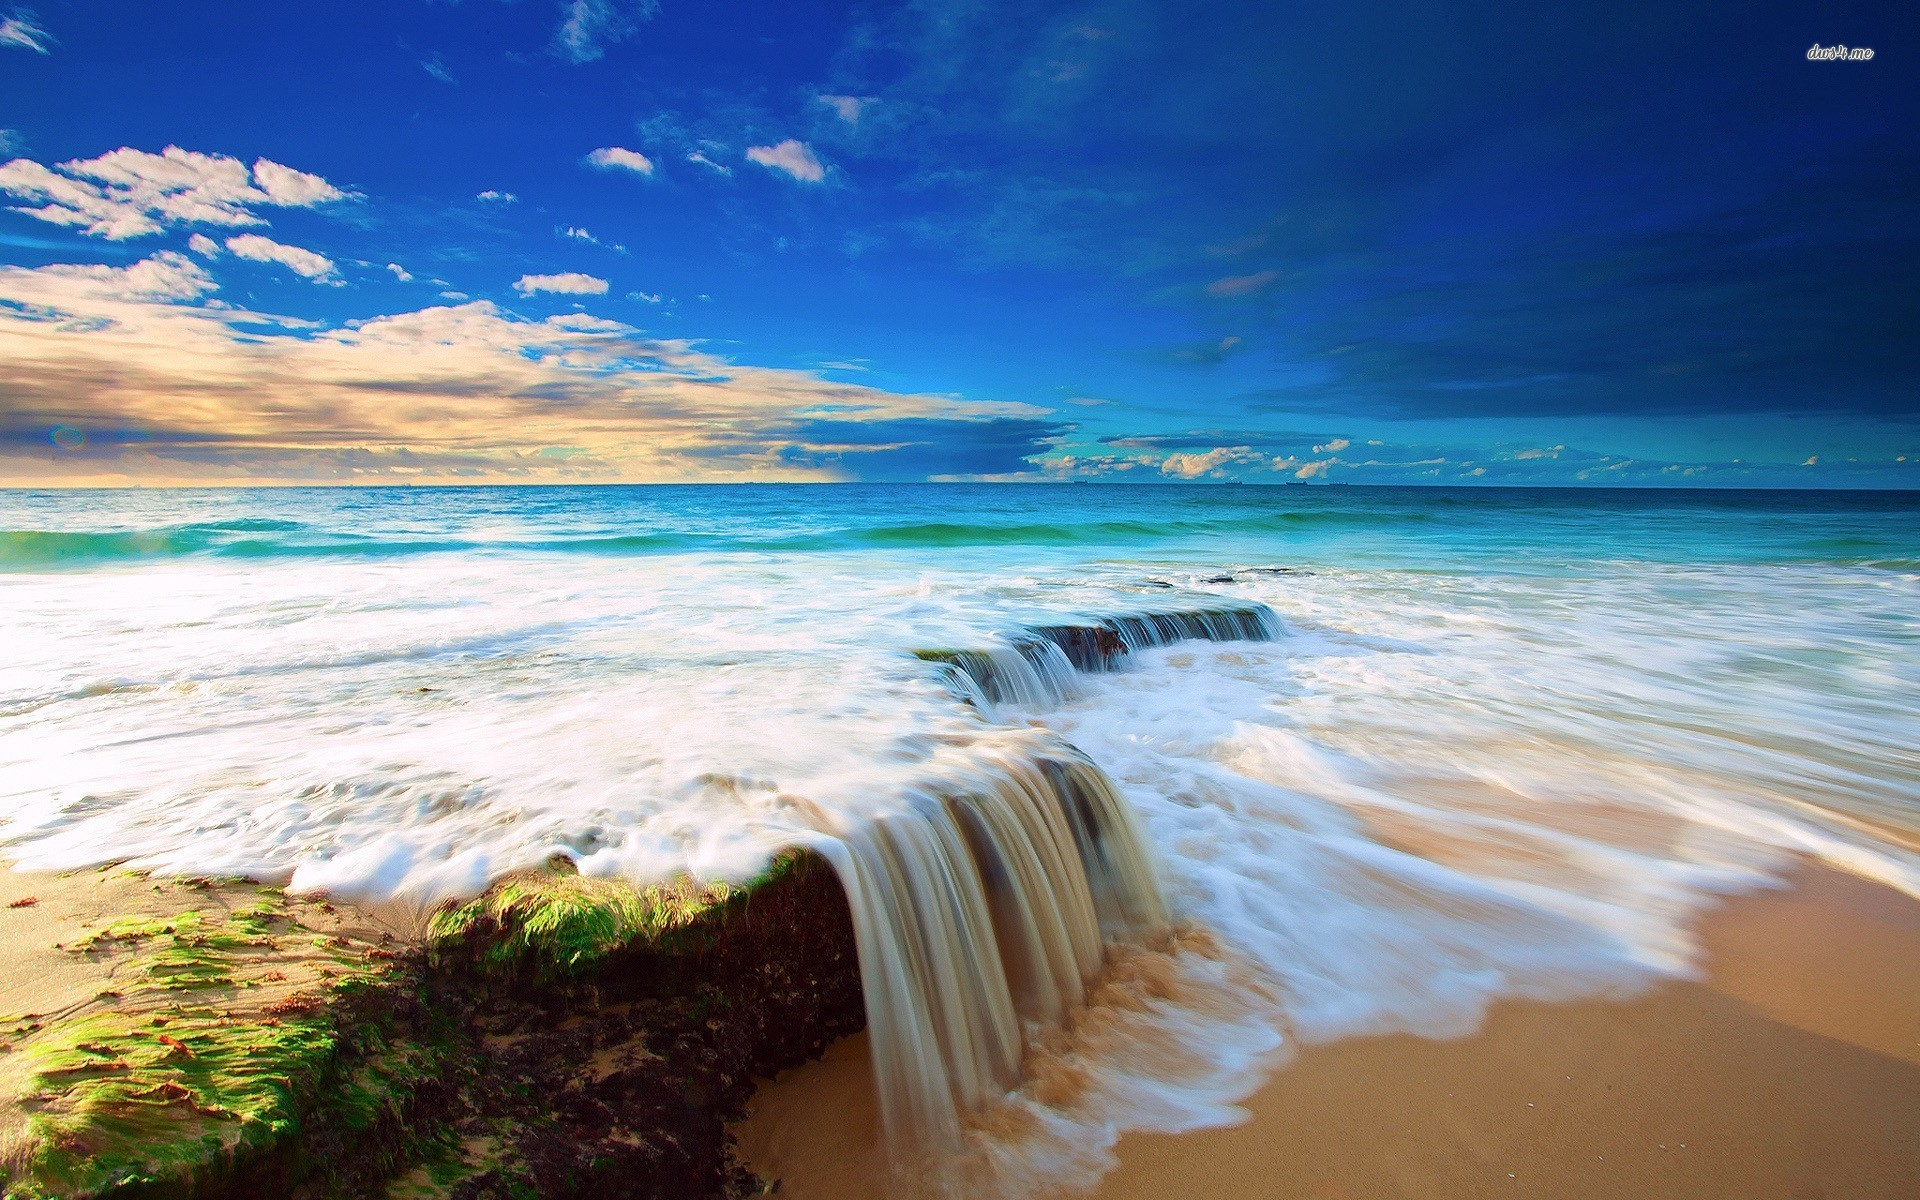 [44+] Ocean Wave Desktop Wallpaper on WallpaperSafari